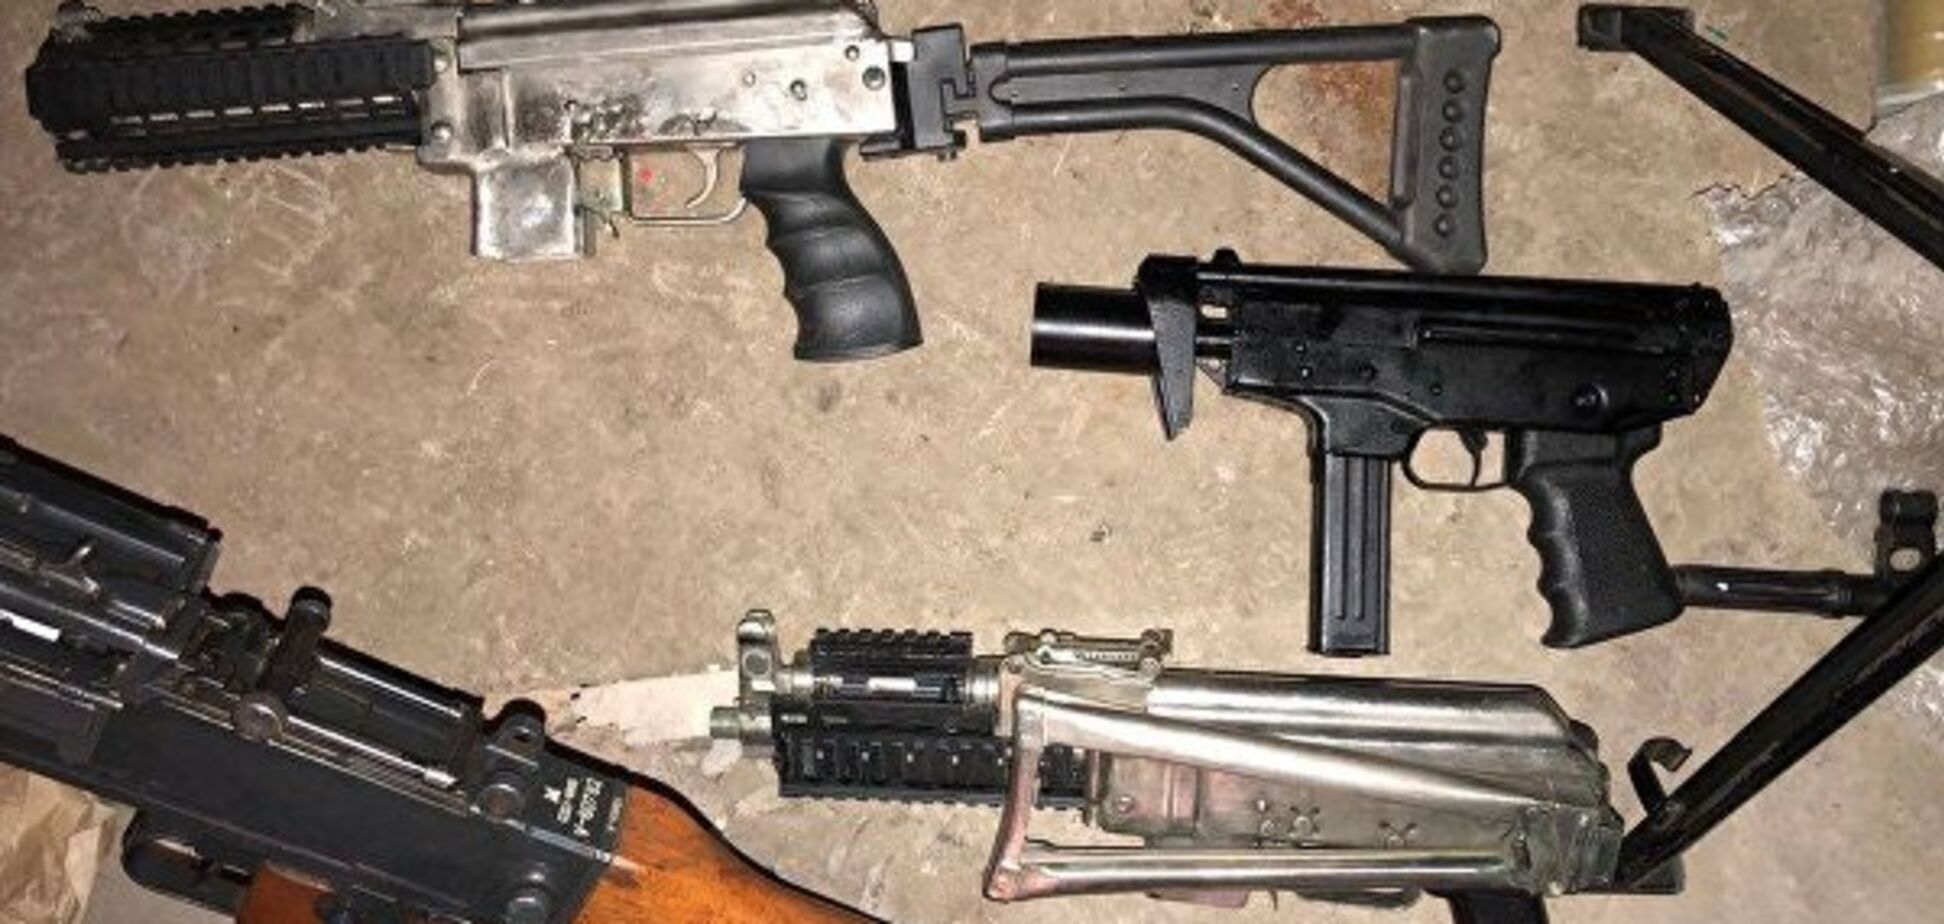 Продають навіть ПЗРК: Україну заполонила нелегальна зброя